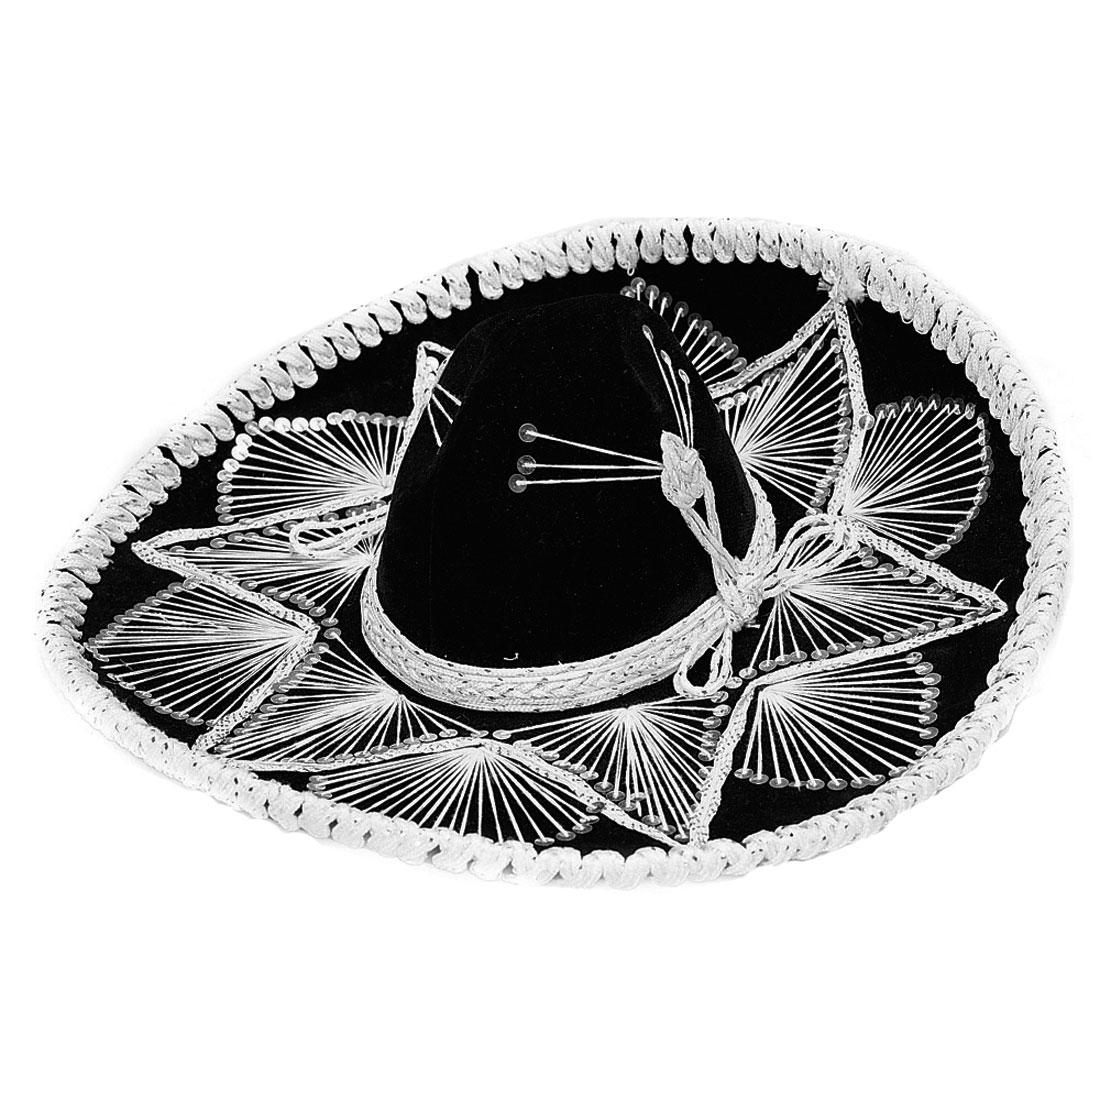 Free Mexican Sombrero, Download Free Clip Art, Free Clip Art.